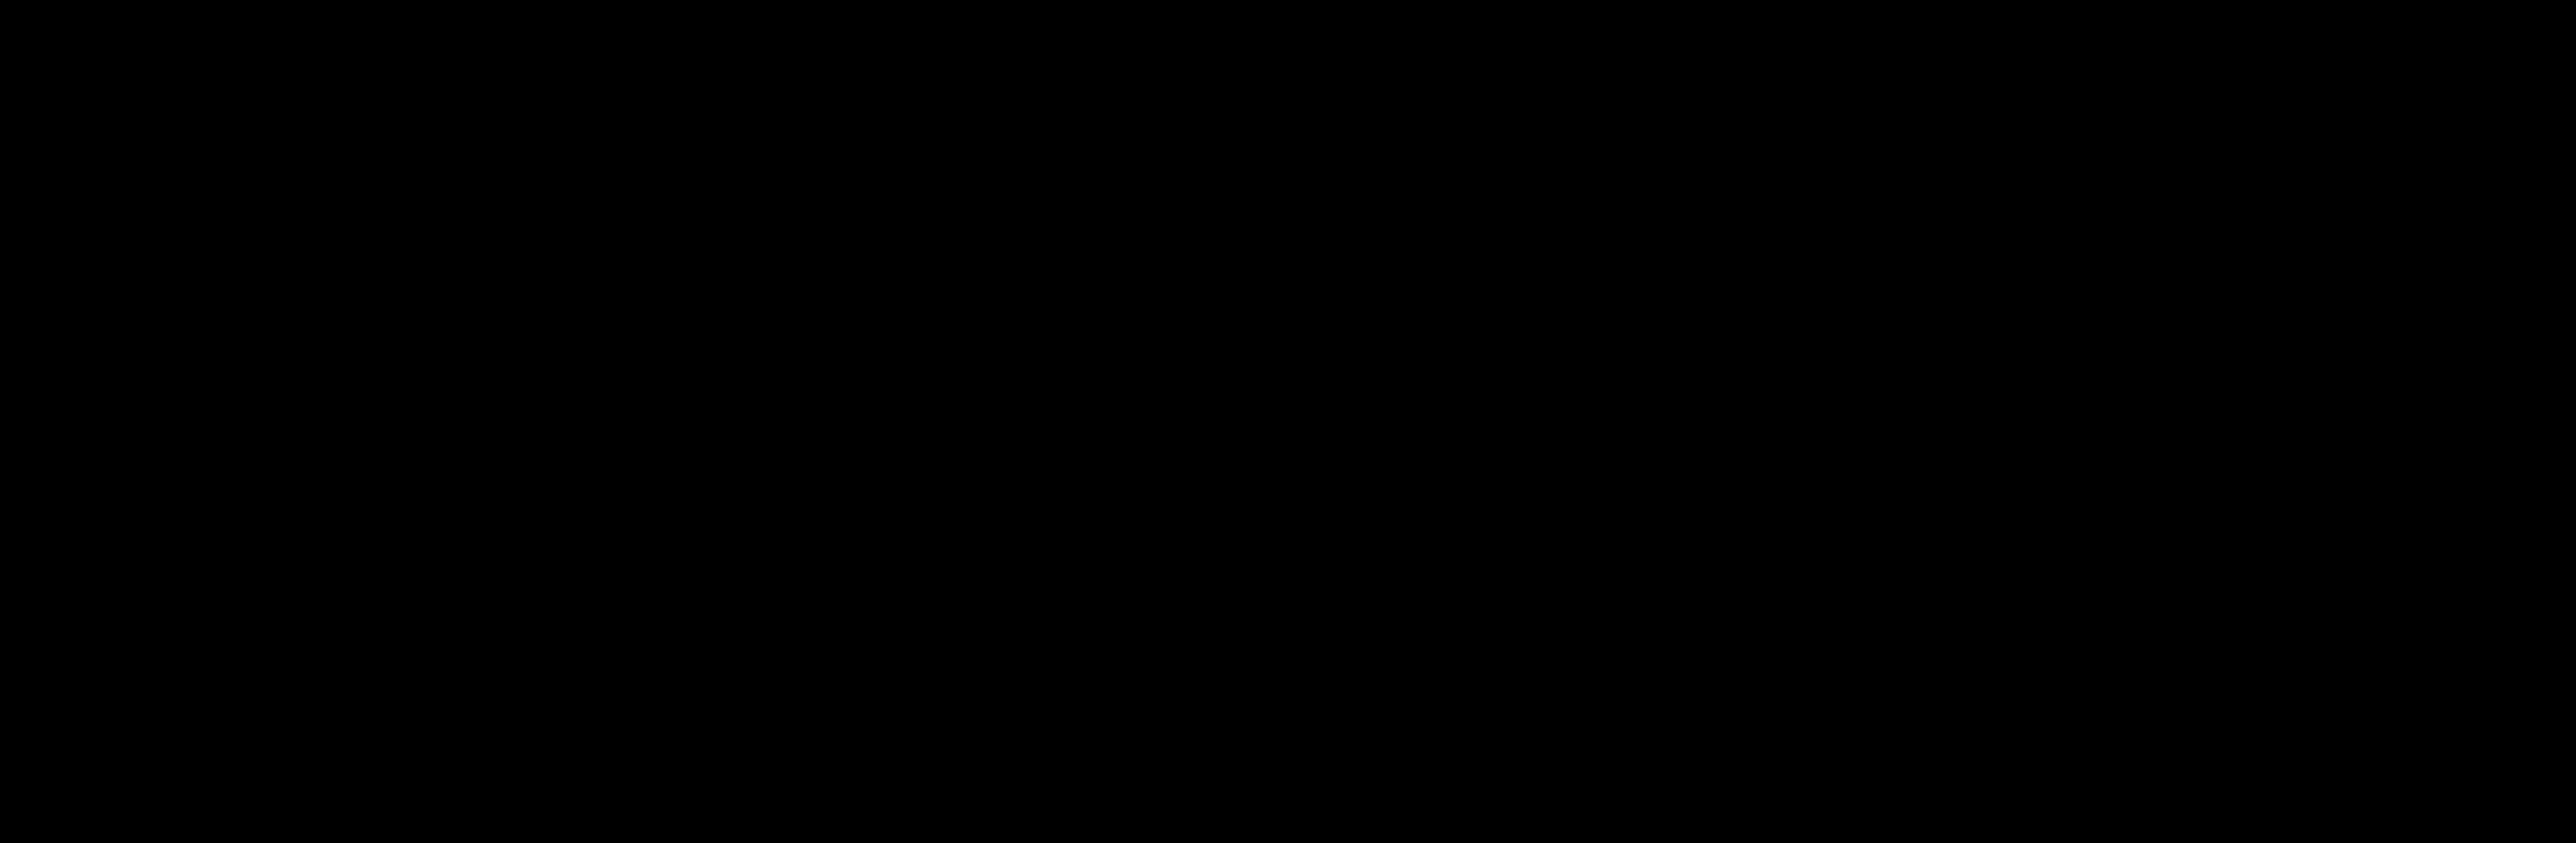 Ray-Ban_2015_NHWYBI_logo_blk